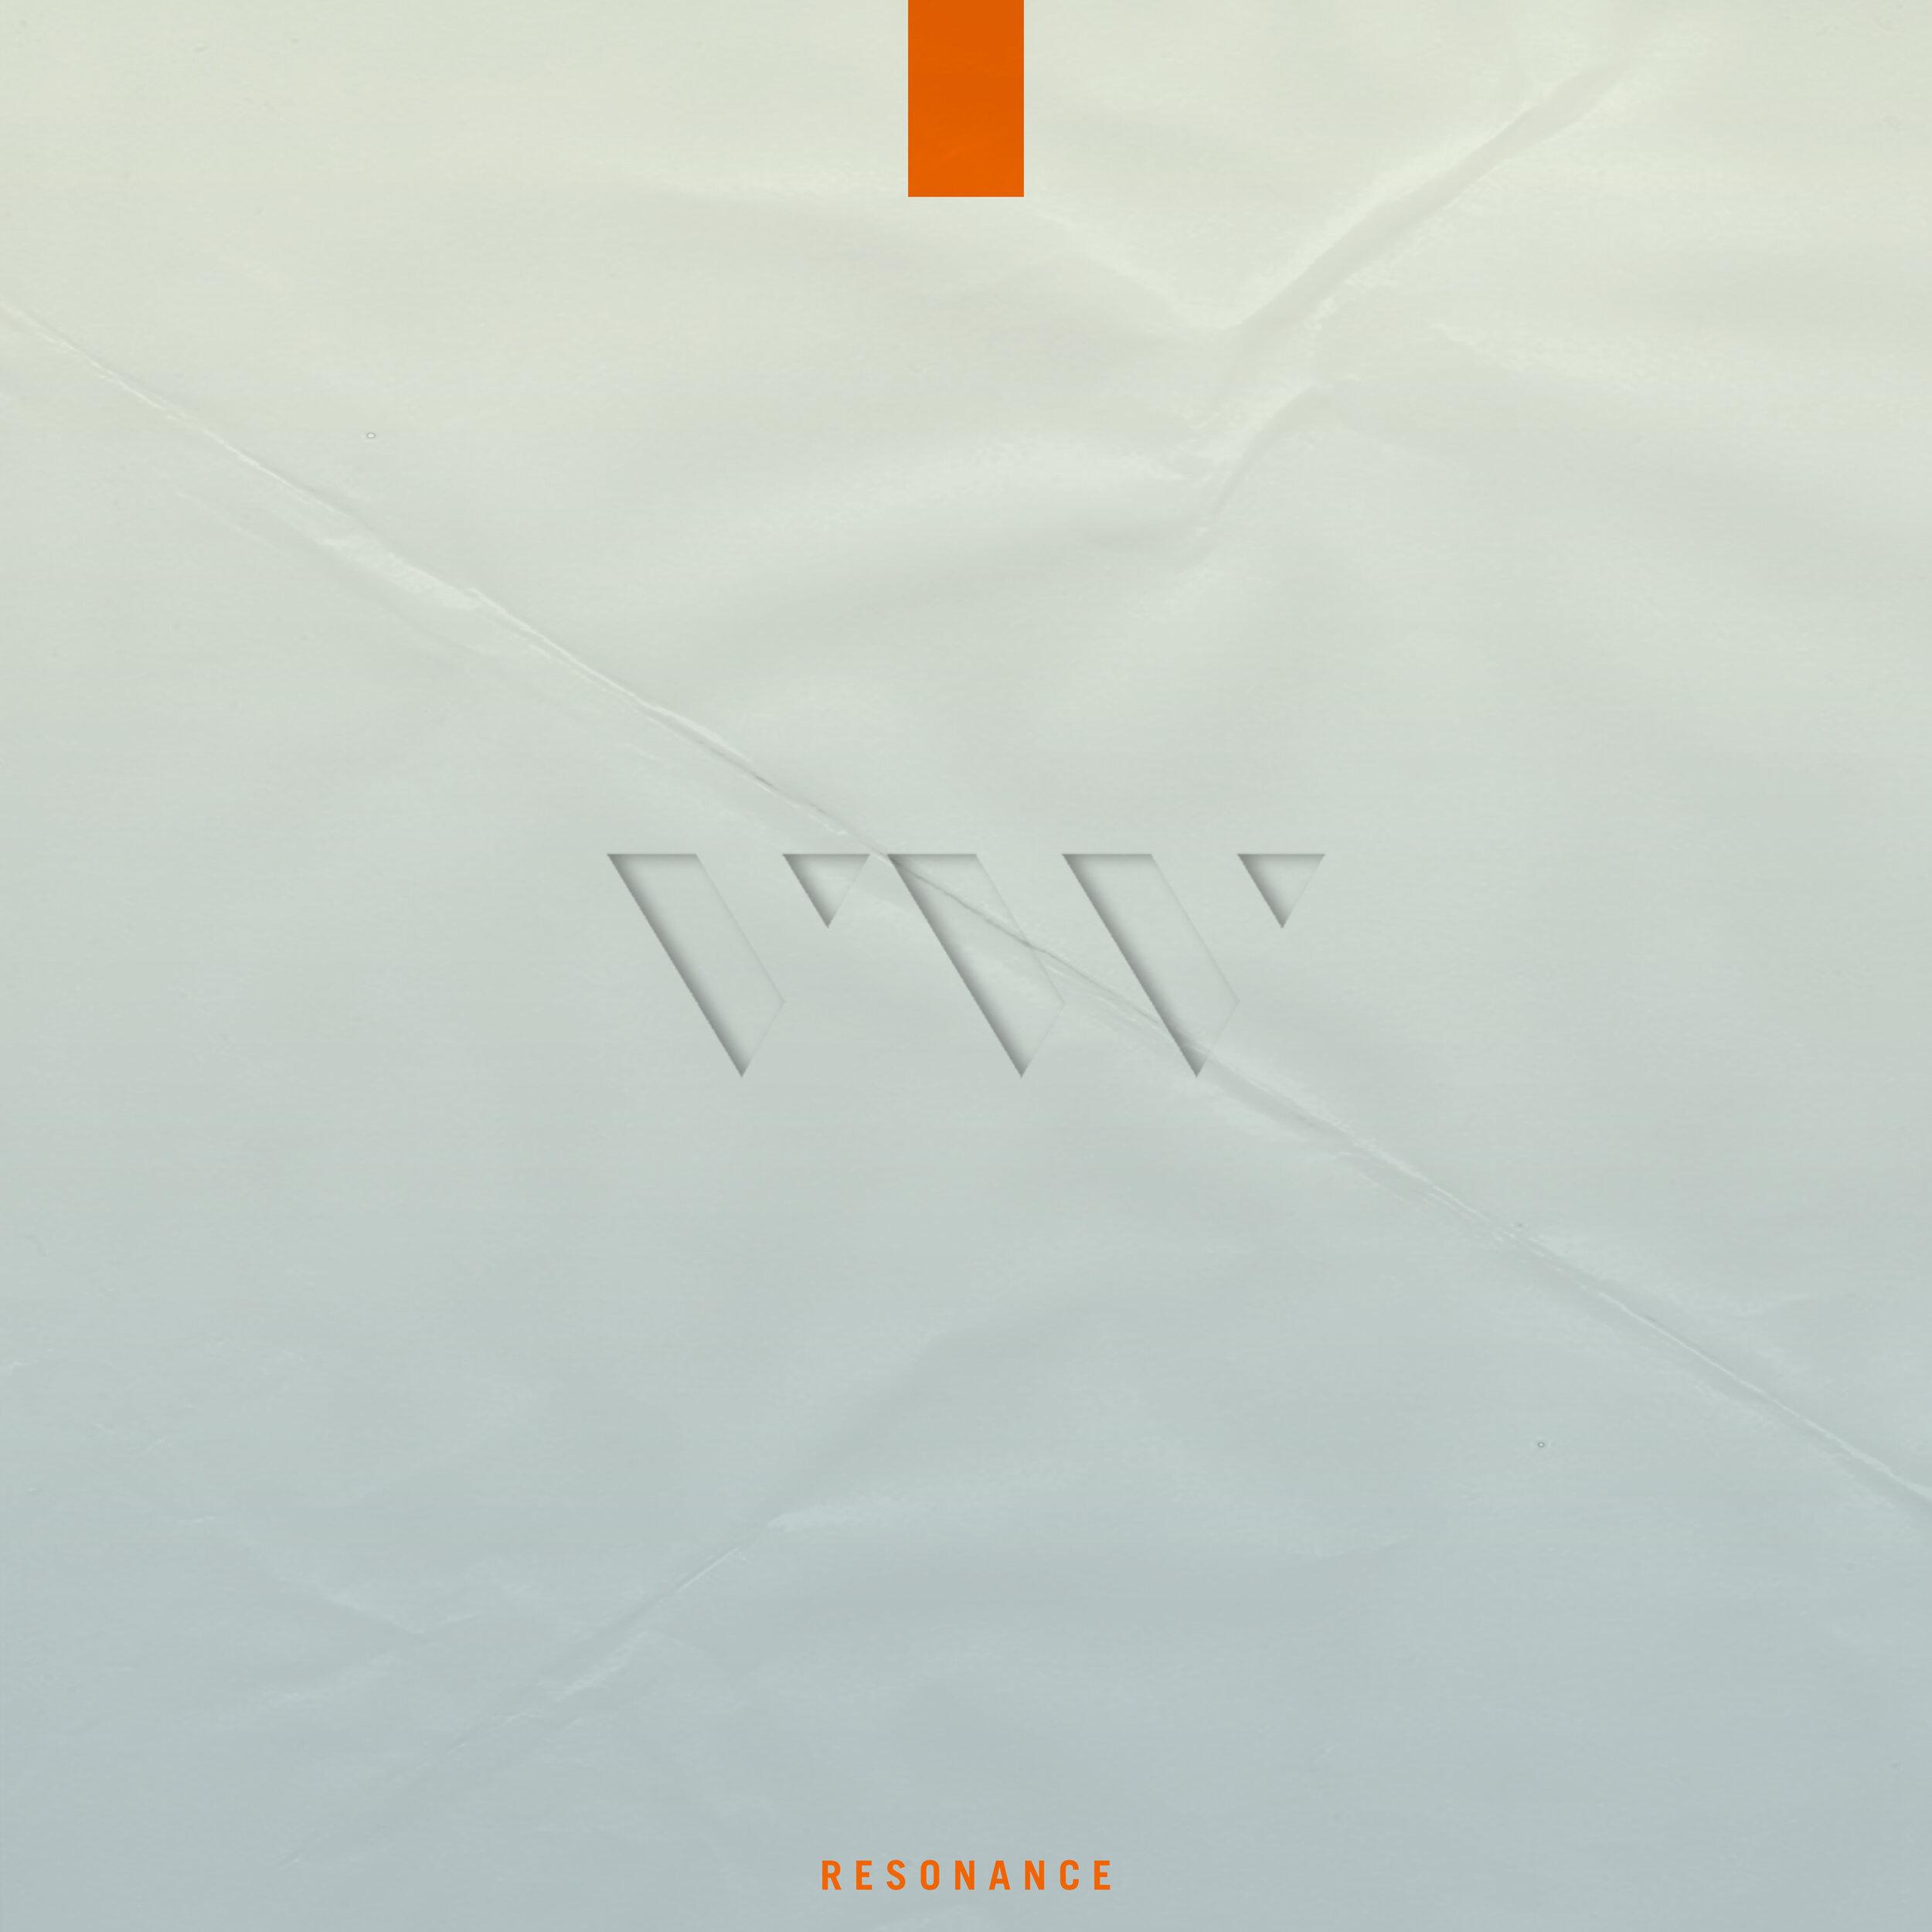 Resonance - Full Album - Charts & Lyrics